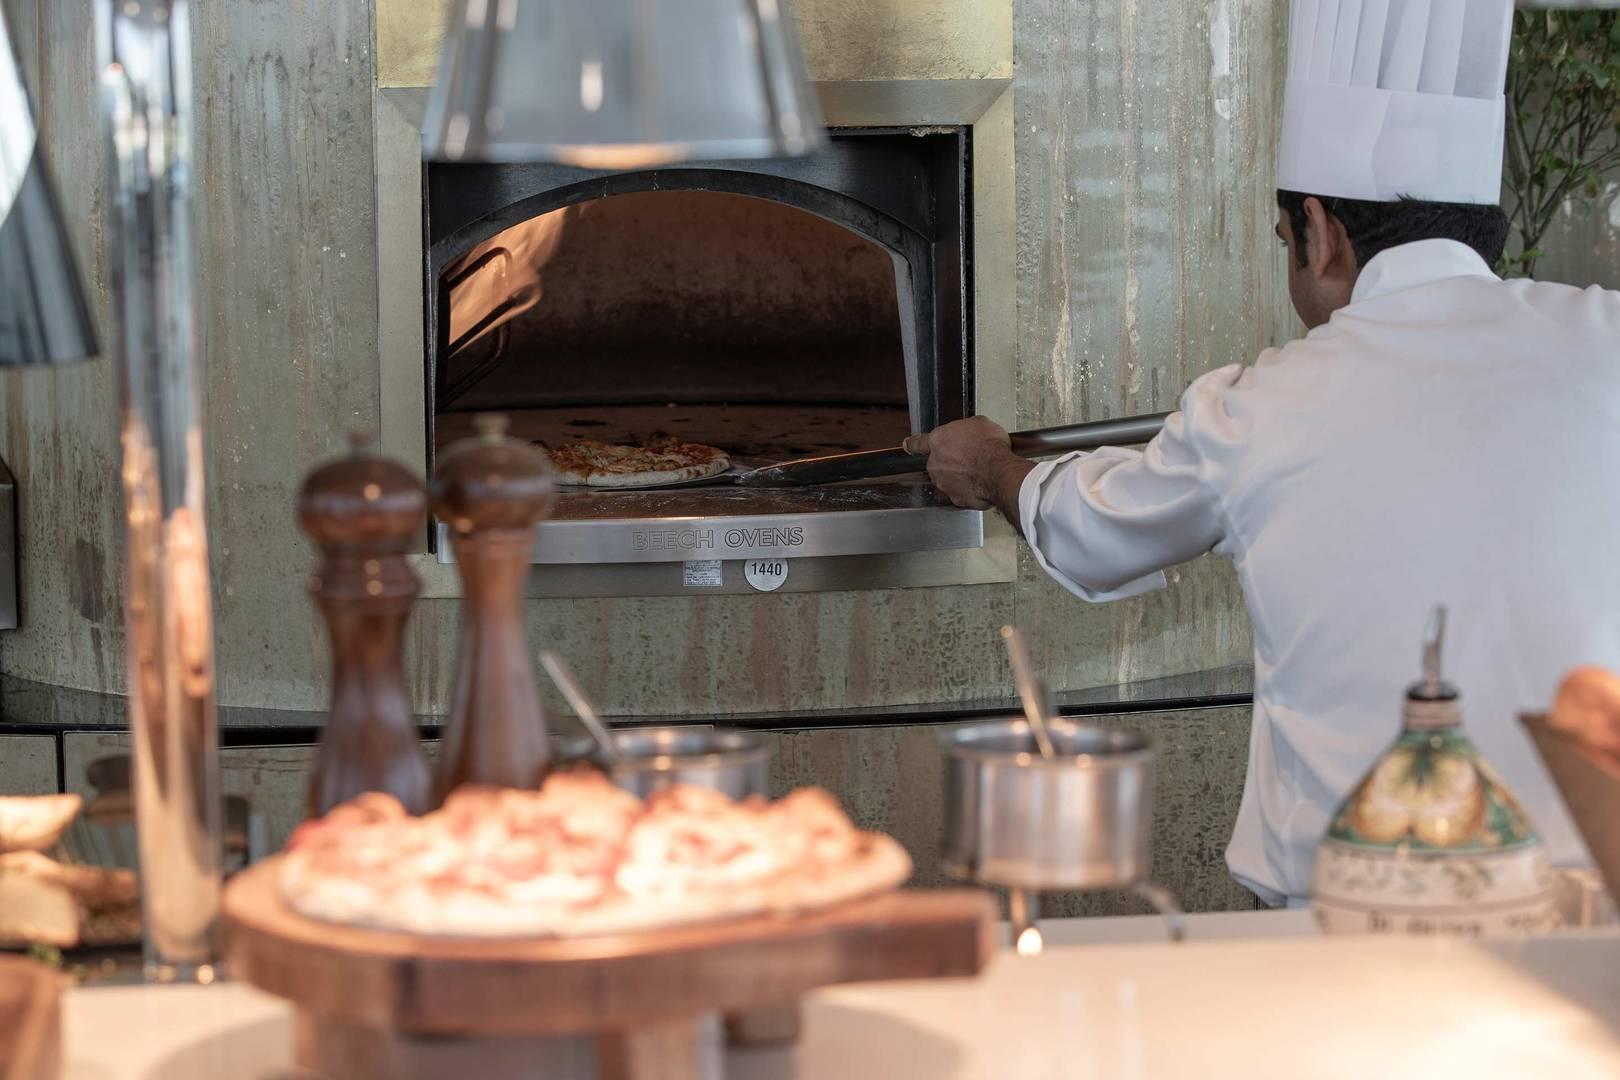 Burj Al Arab Bab Al Yam pizza oven and chef